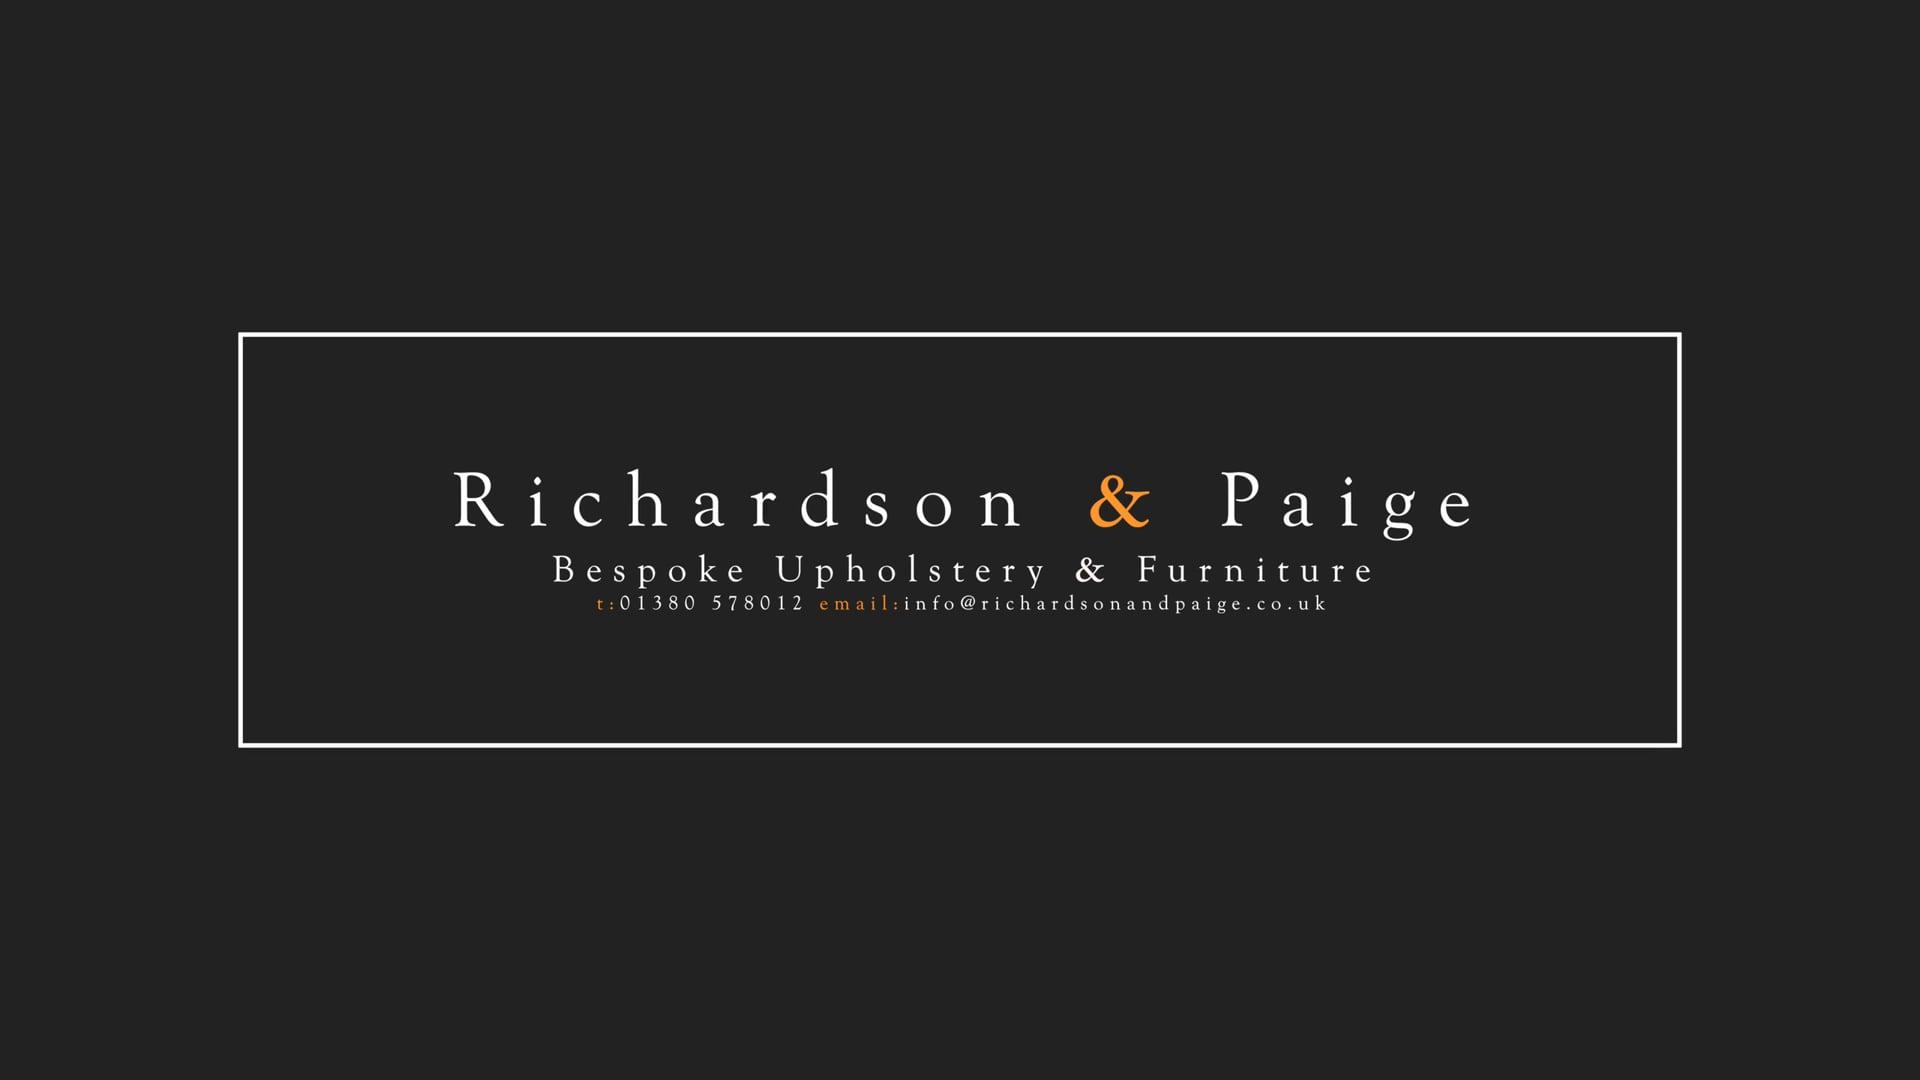 Richardson & Paige